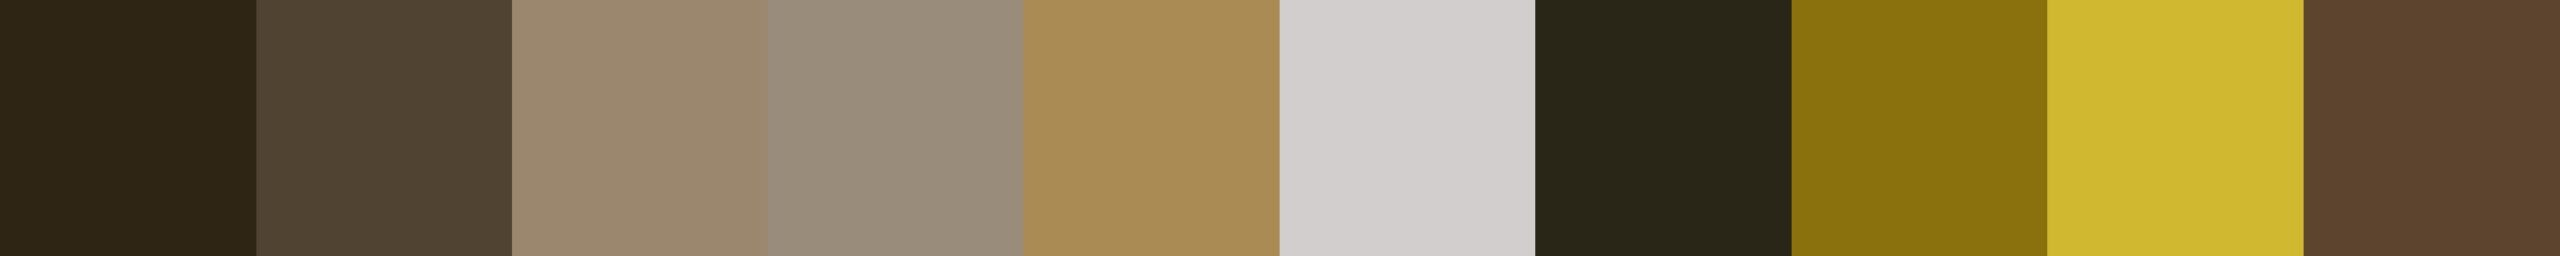 616 Cikredo Color Palette